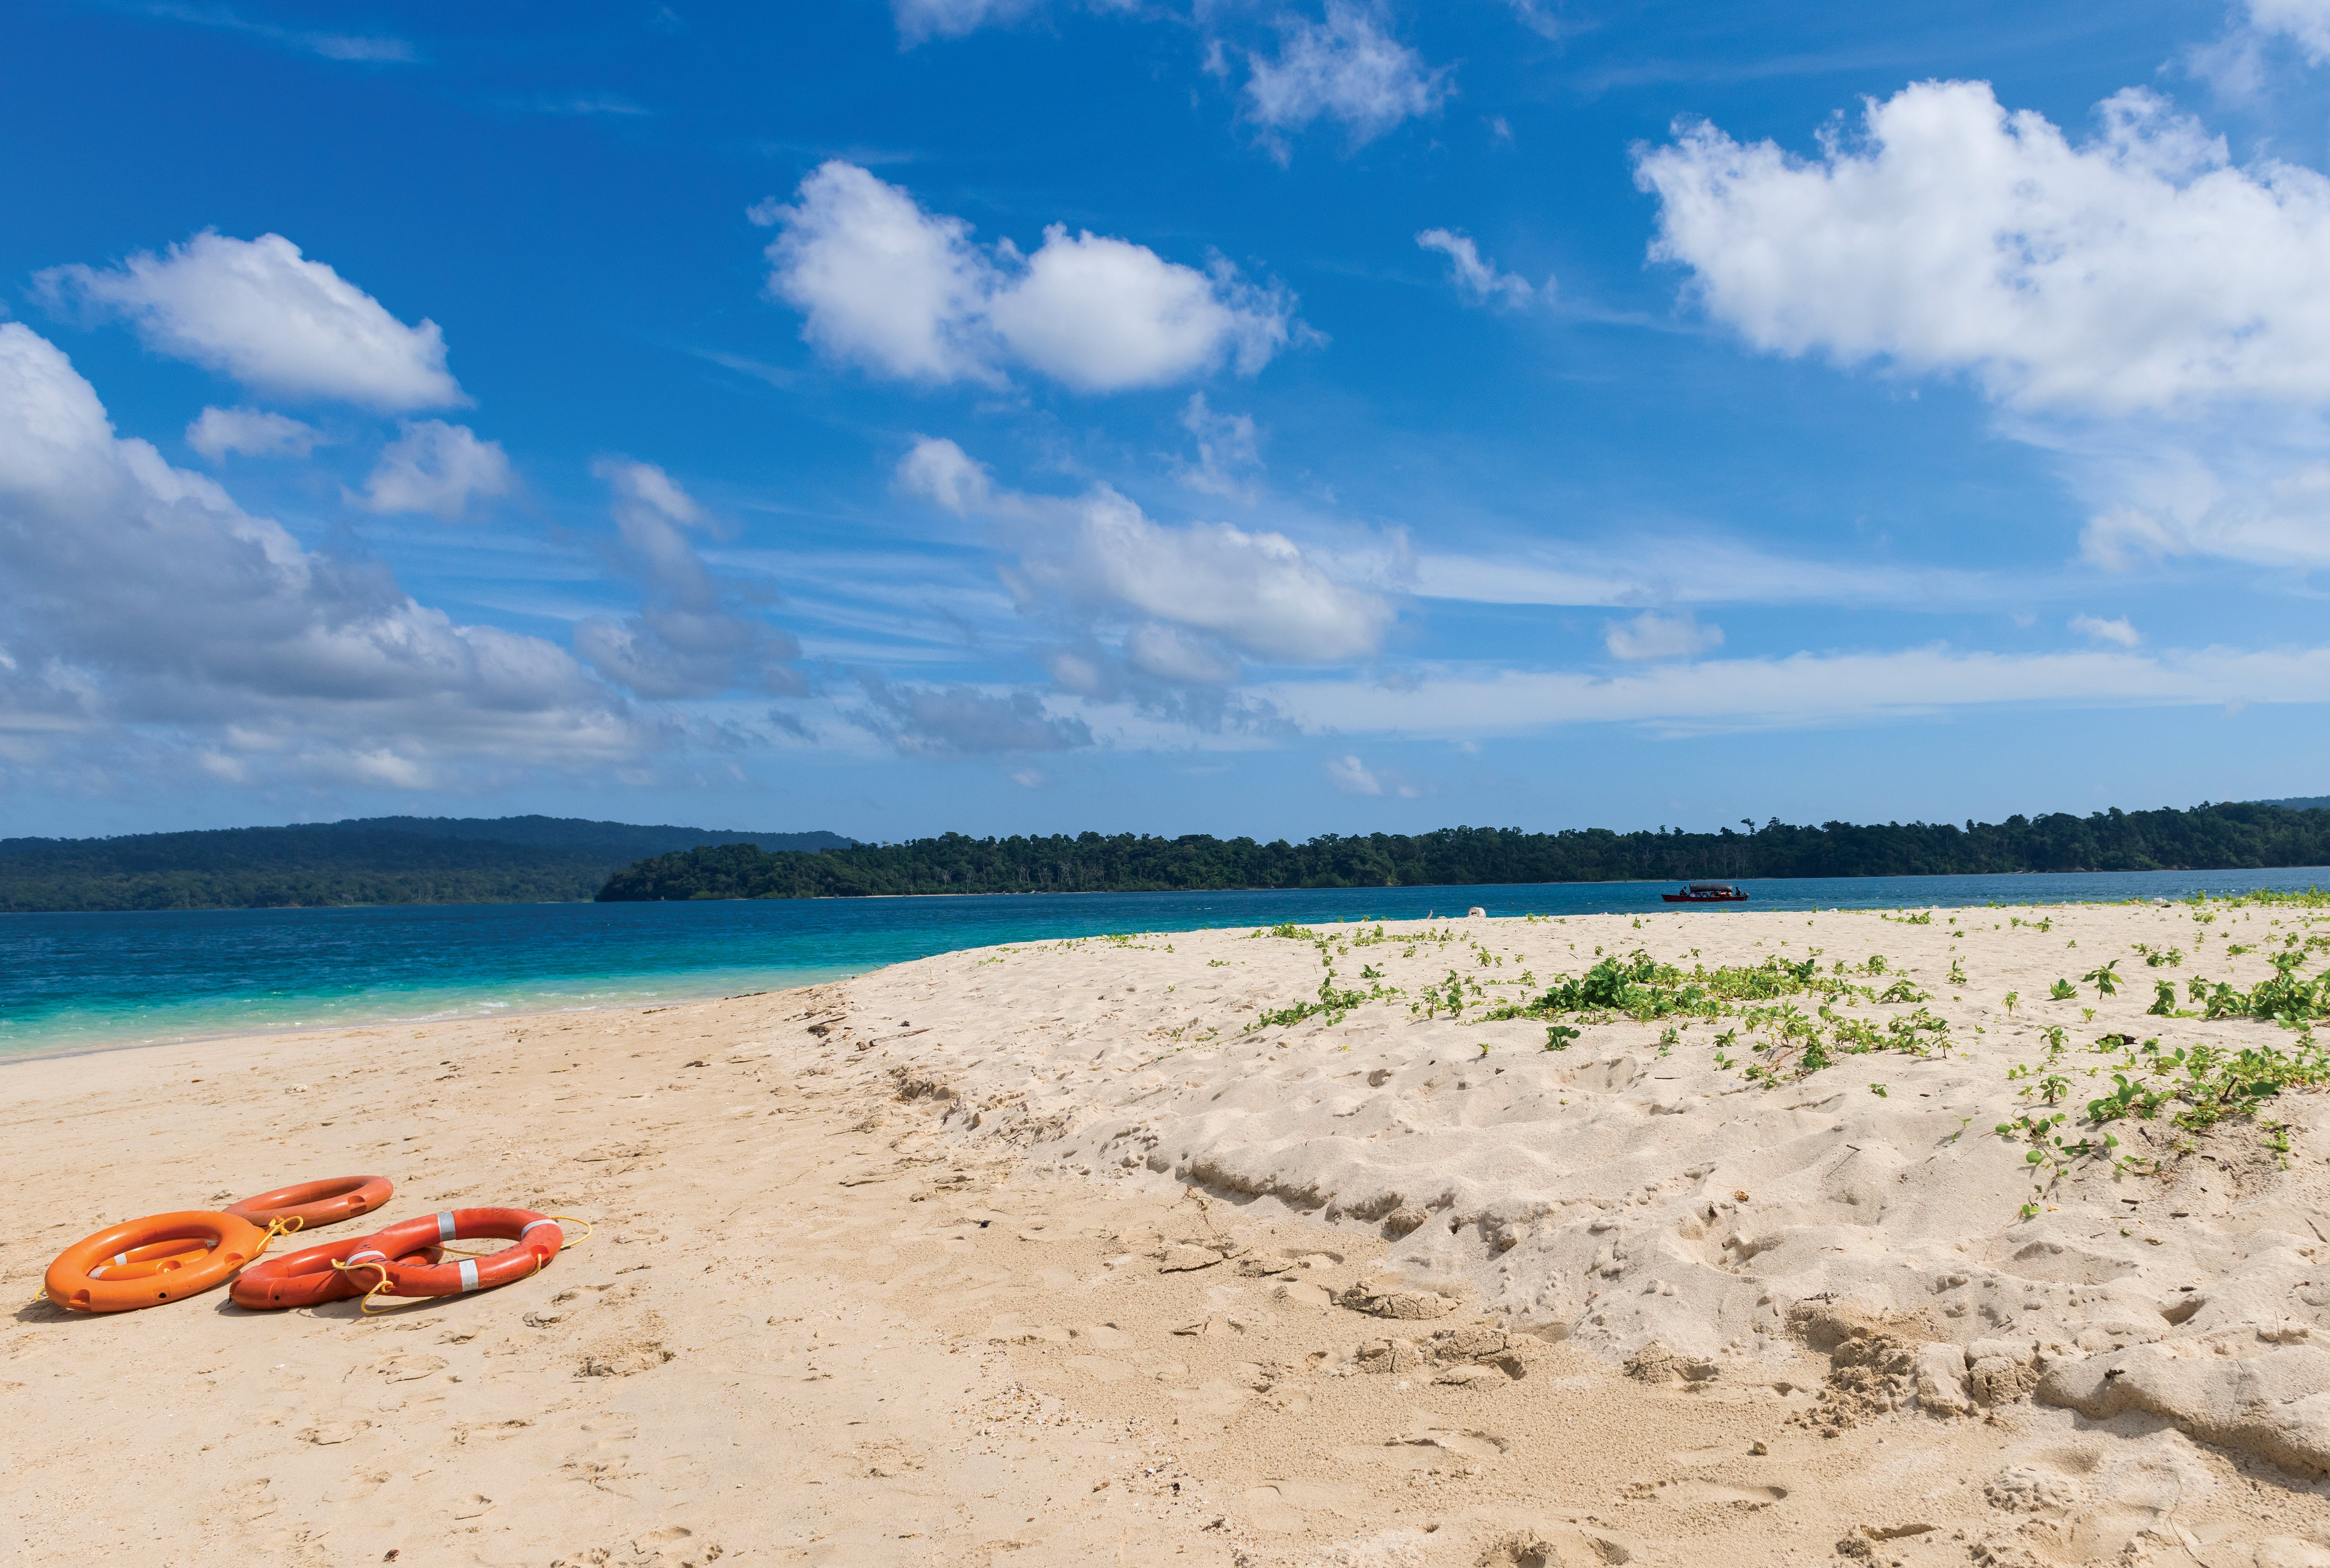 Picturesque Andaman & Nicobar Islands